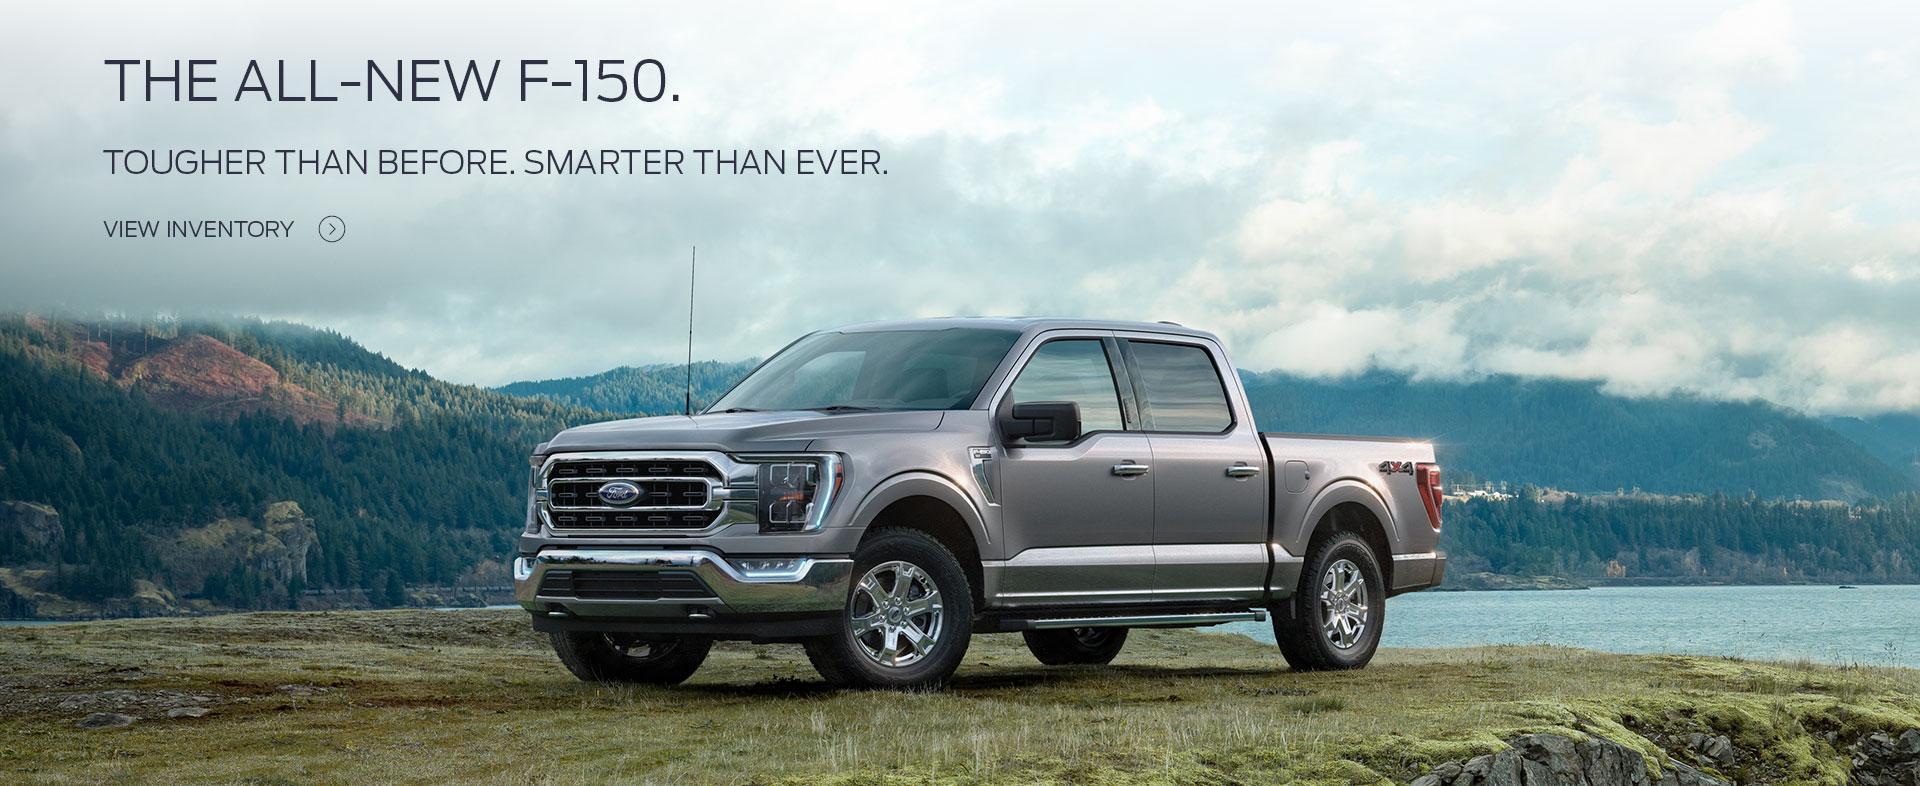 2021 F-150 | Joe Meloche Ford Sales